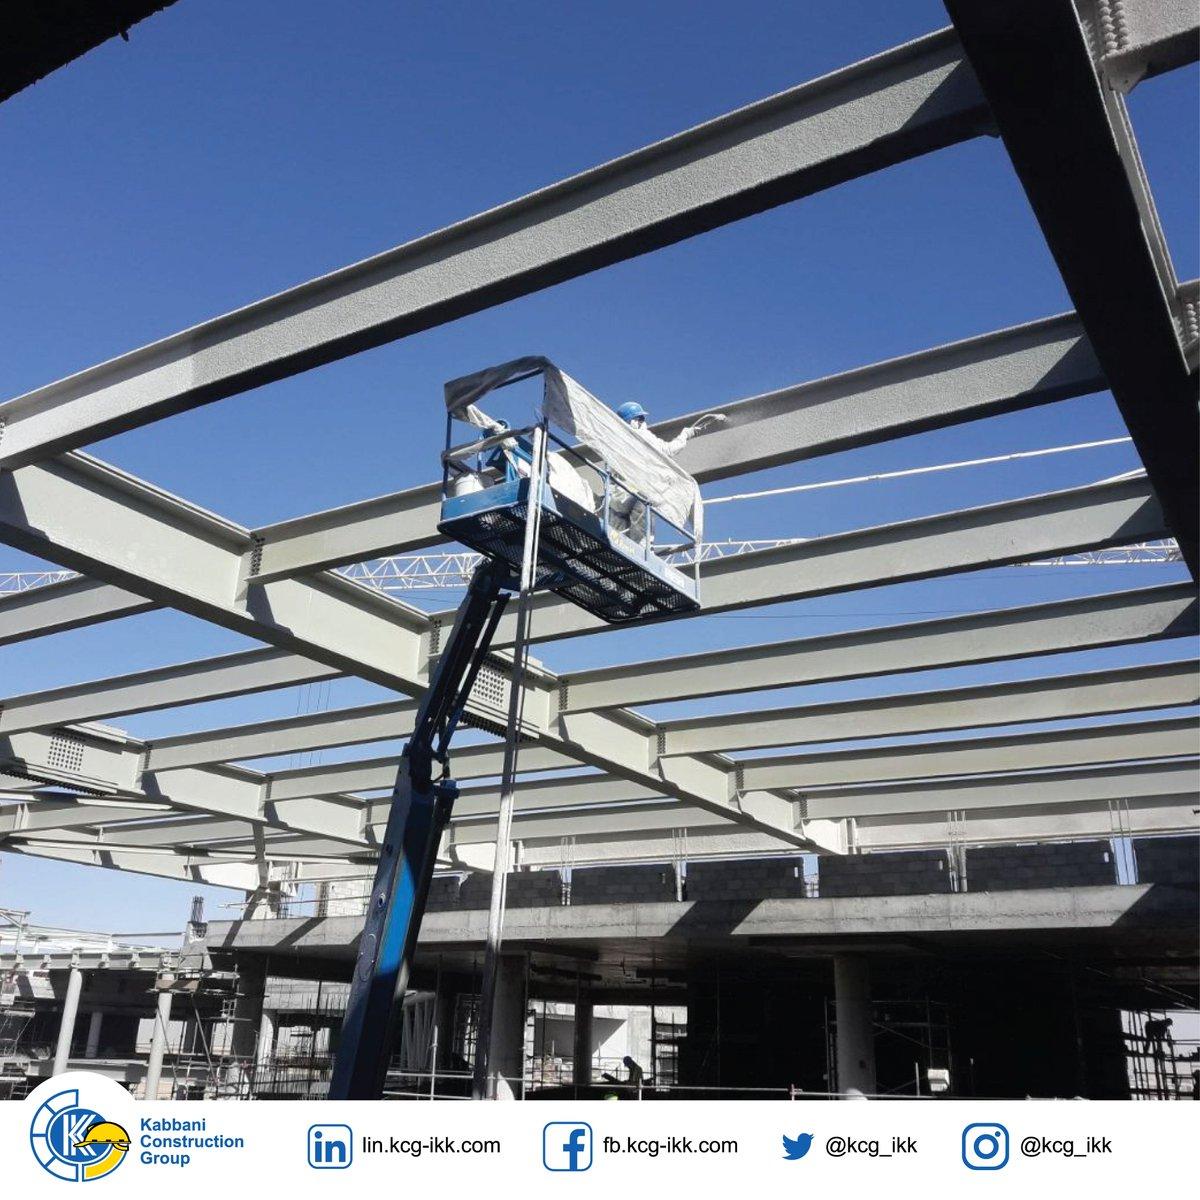 Kabbani Construction Group- KCG on Twitter: